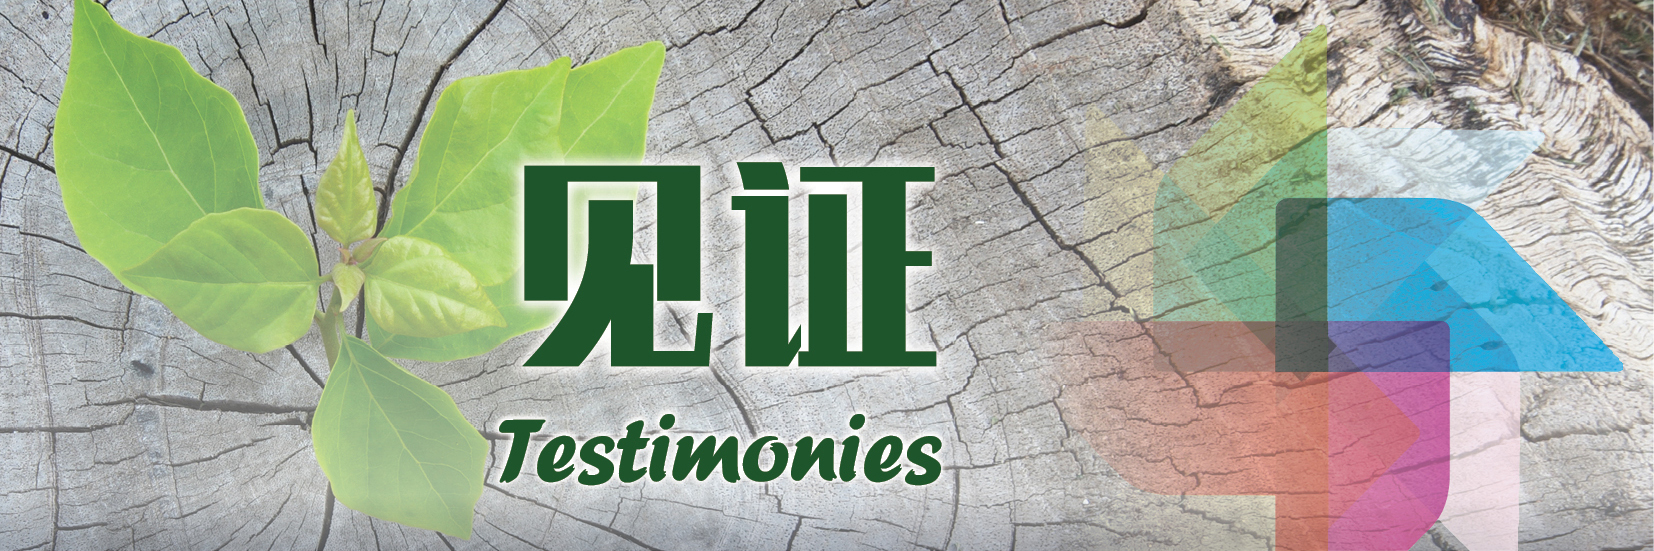 testimony banner